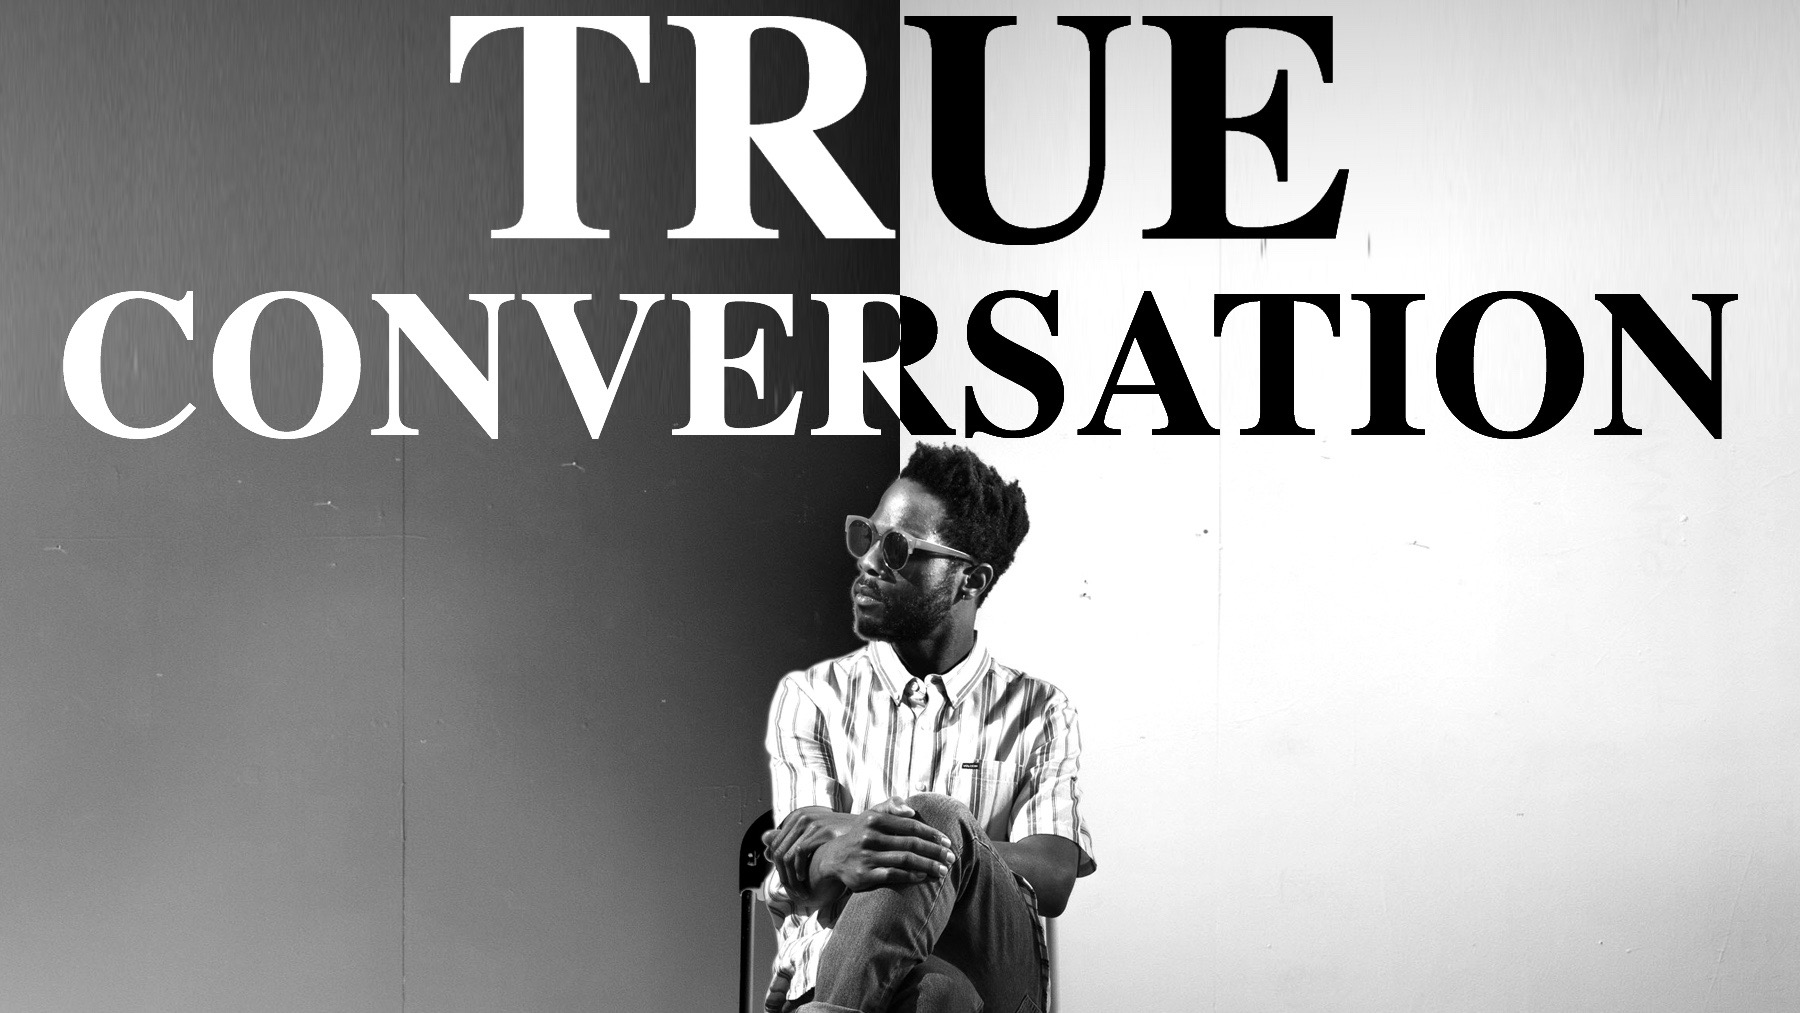 TrueConversation Cover Image